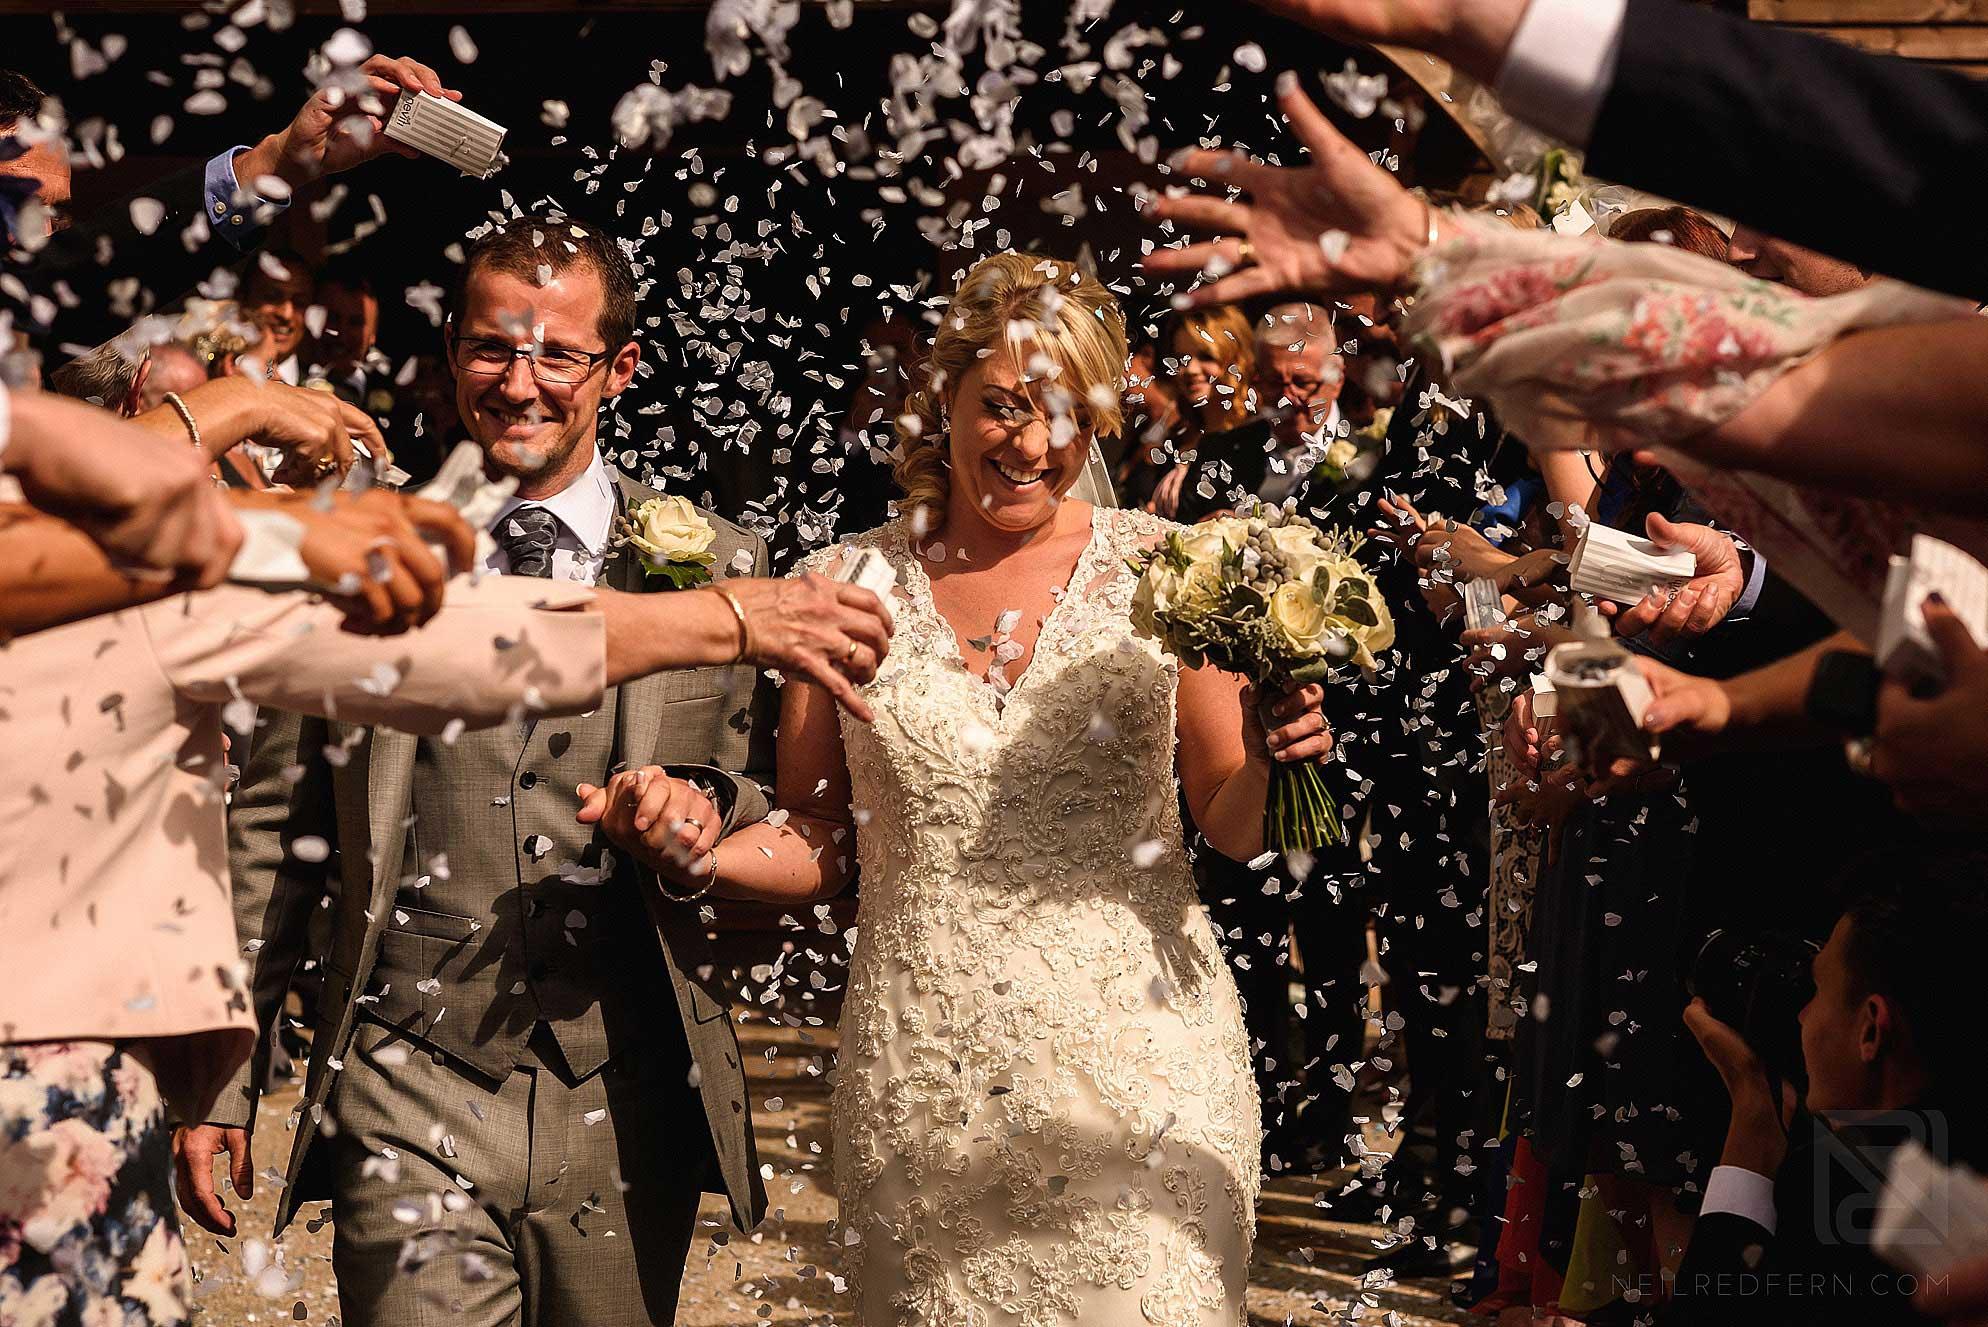 throwing confetti at wedding